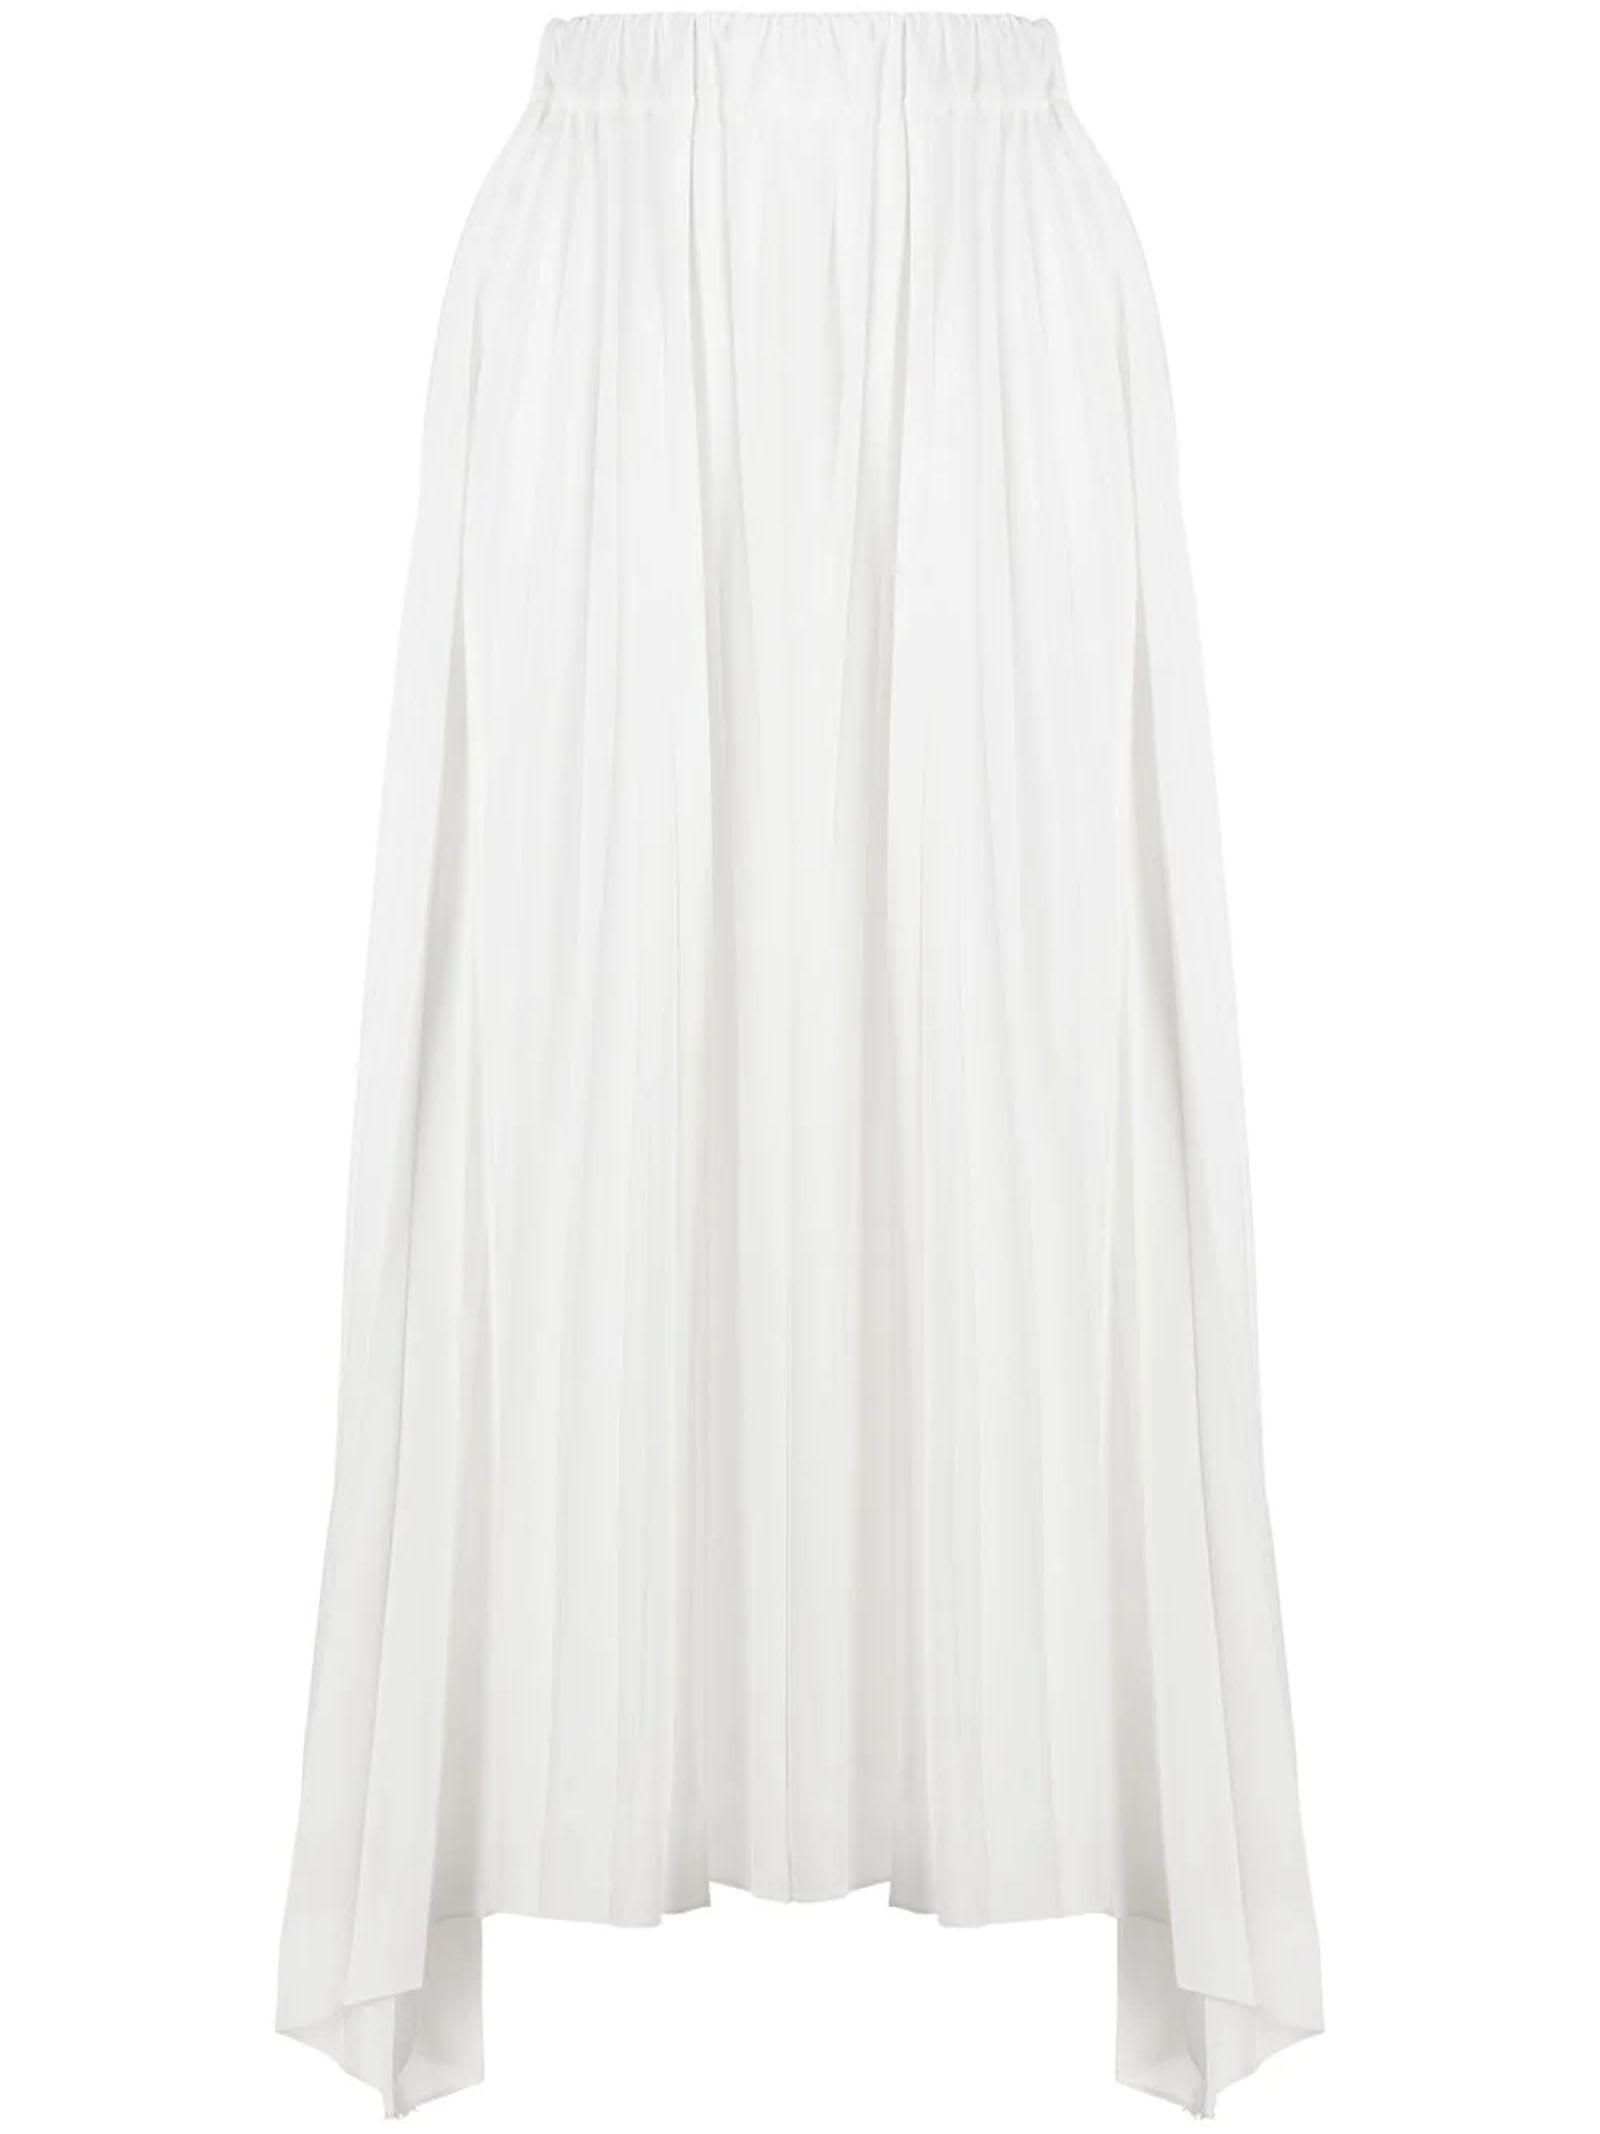 Antonelli Pleated skirts WHITE MIDI SKIRT